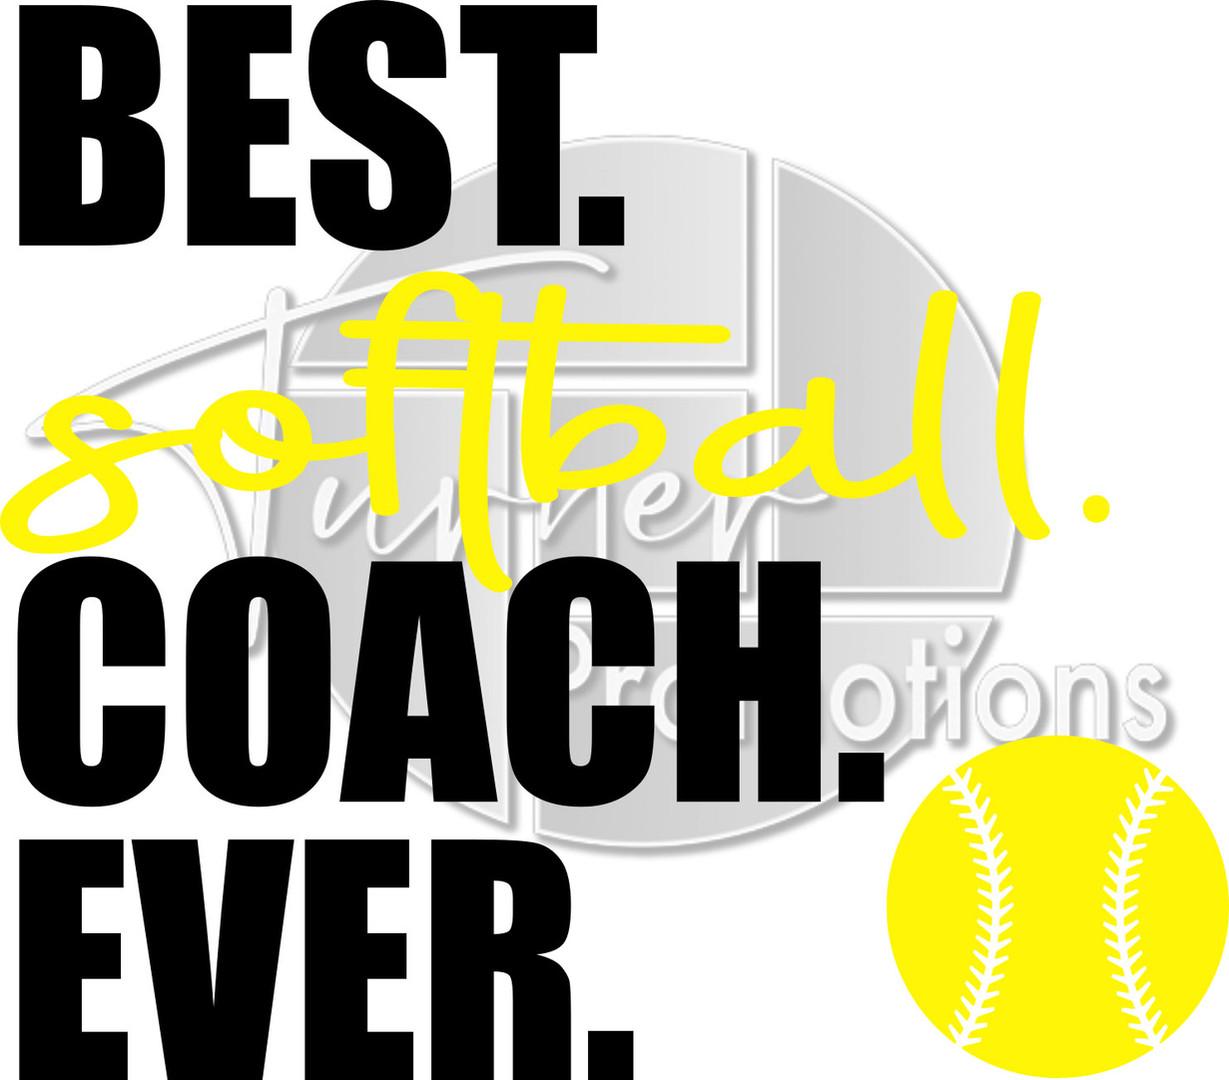 bestsoftballcoachever3.jpg